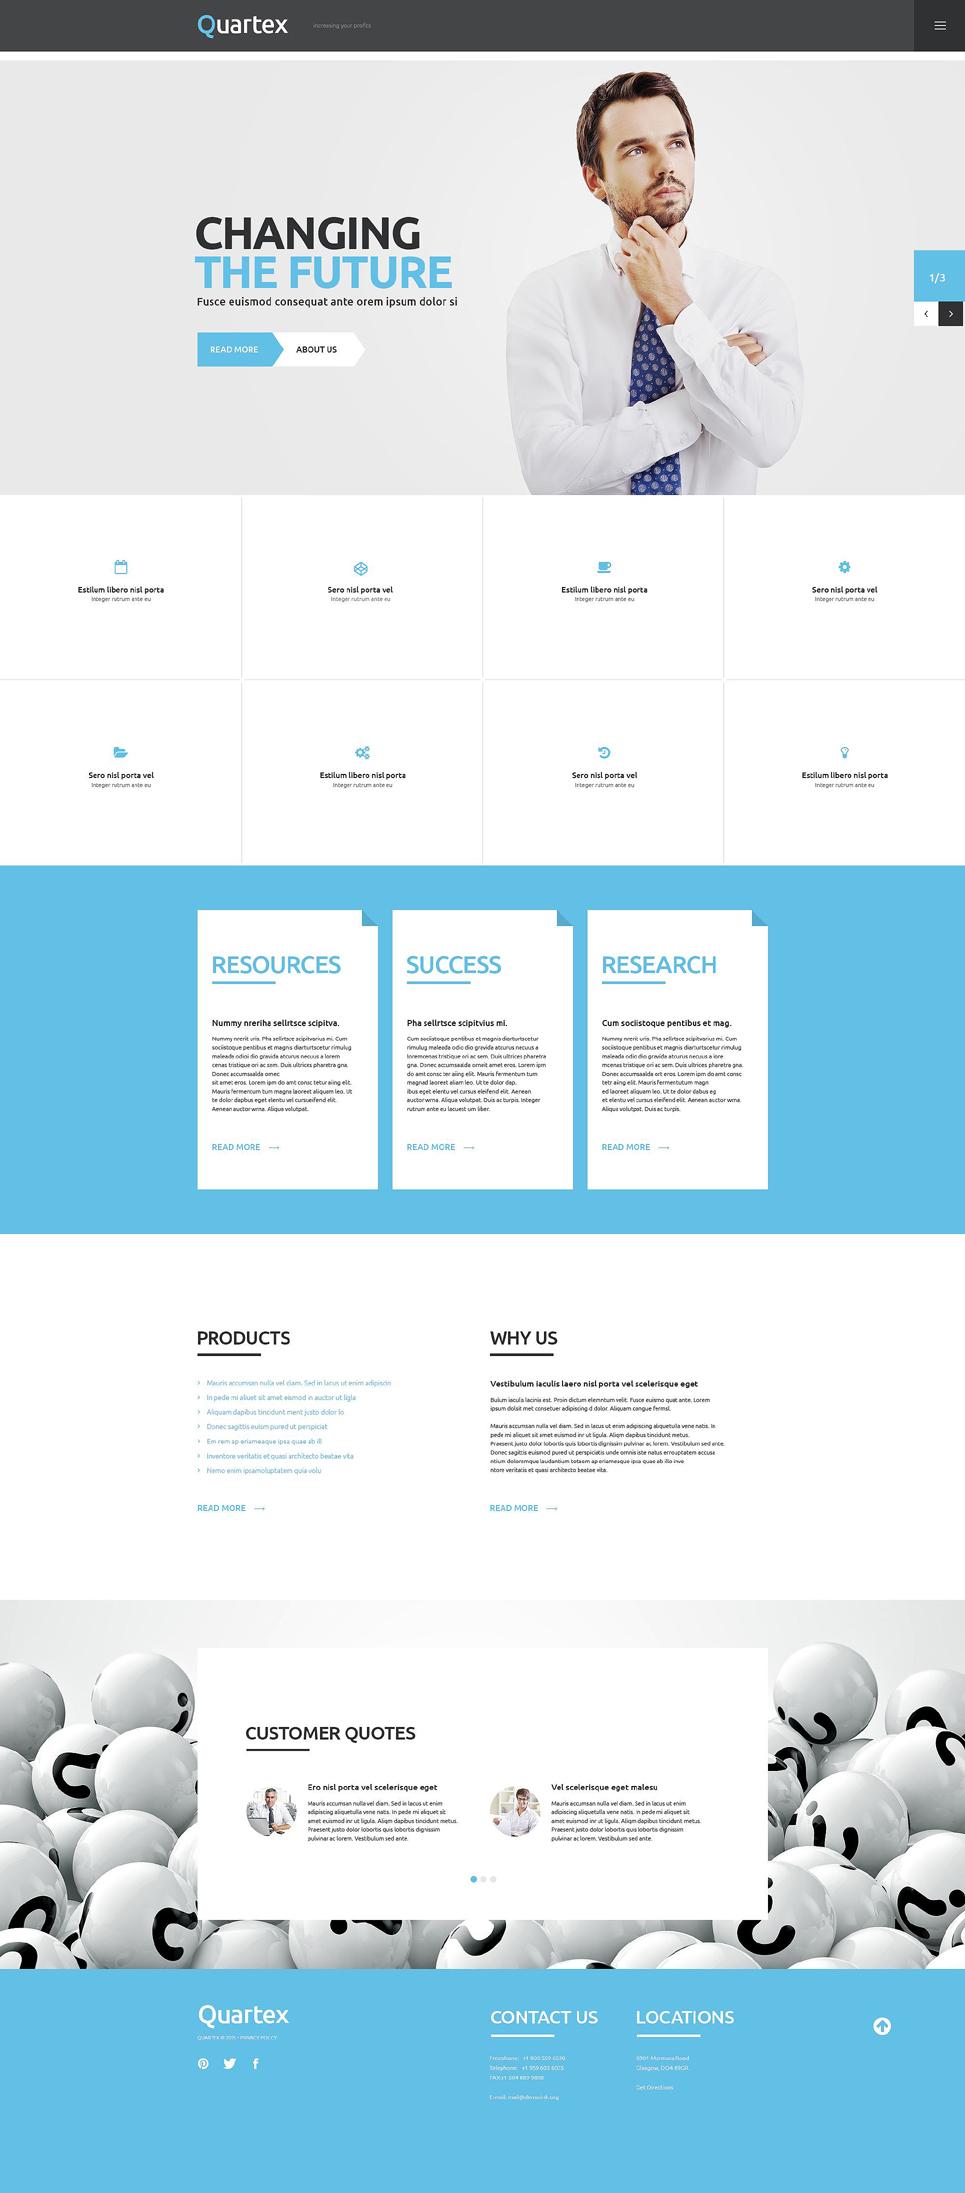 Адаптивный шаблон сайта на тему бизнес и услуги #54941